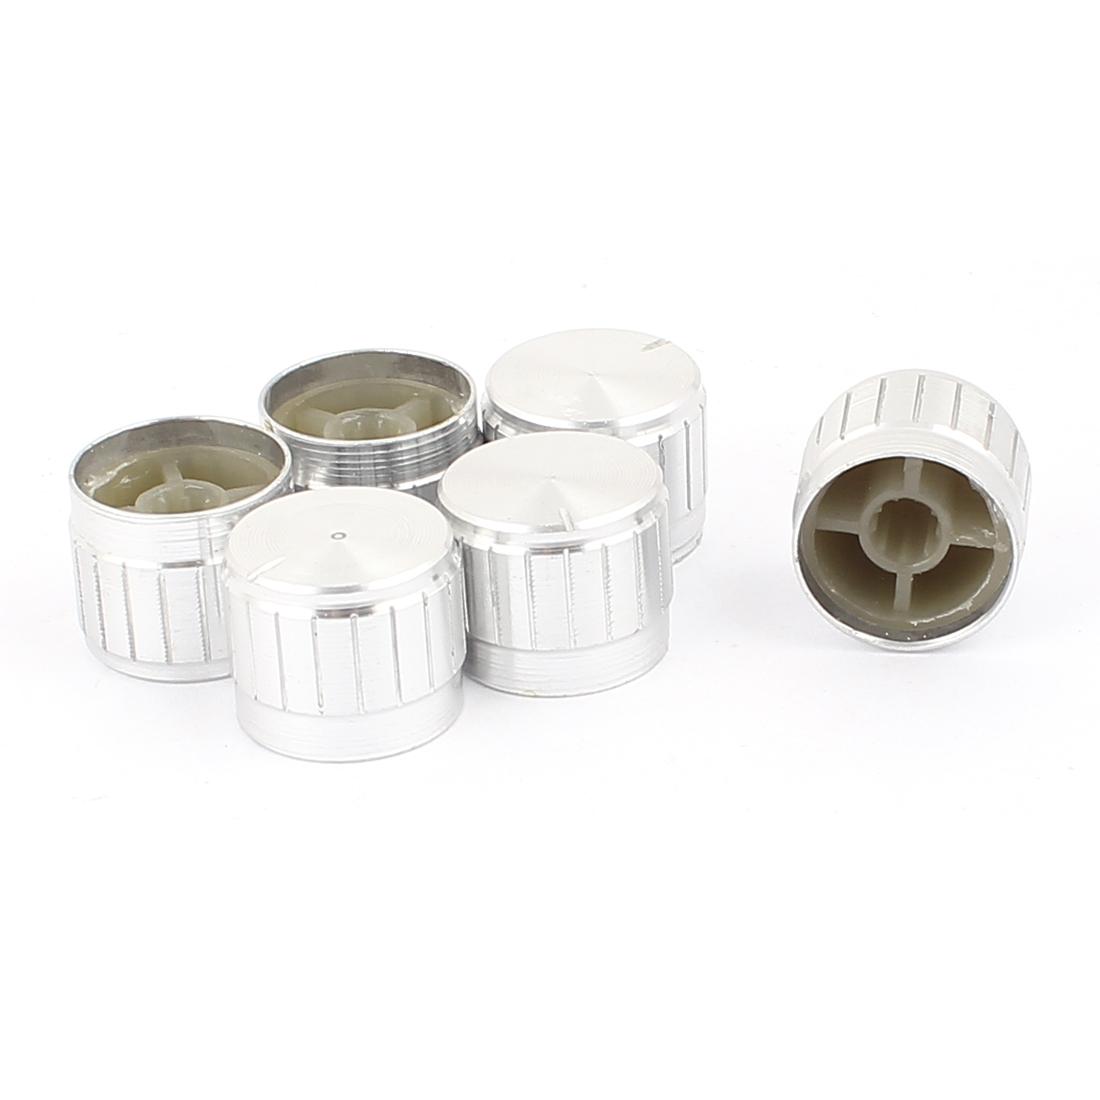 6 Pcs 21mm x 6mm Aluminium Alloy Potentiometer Control Knob Mini Cap Knurled Button Silver Tone